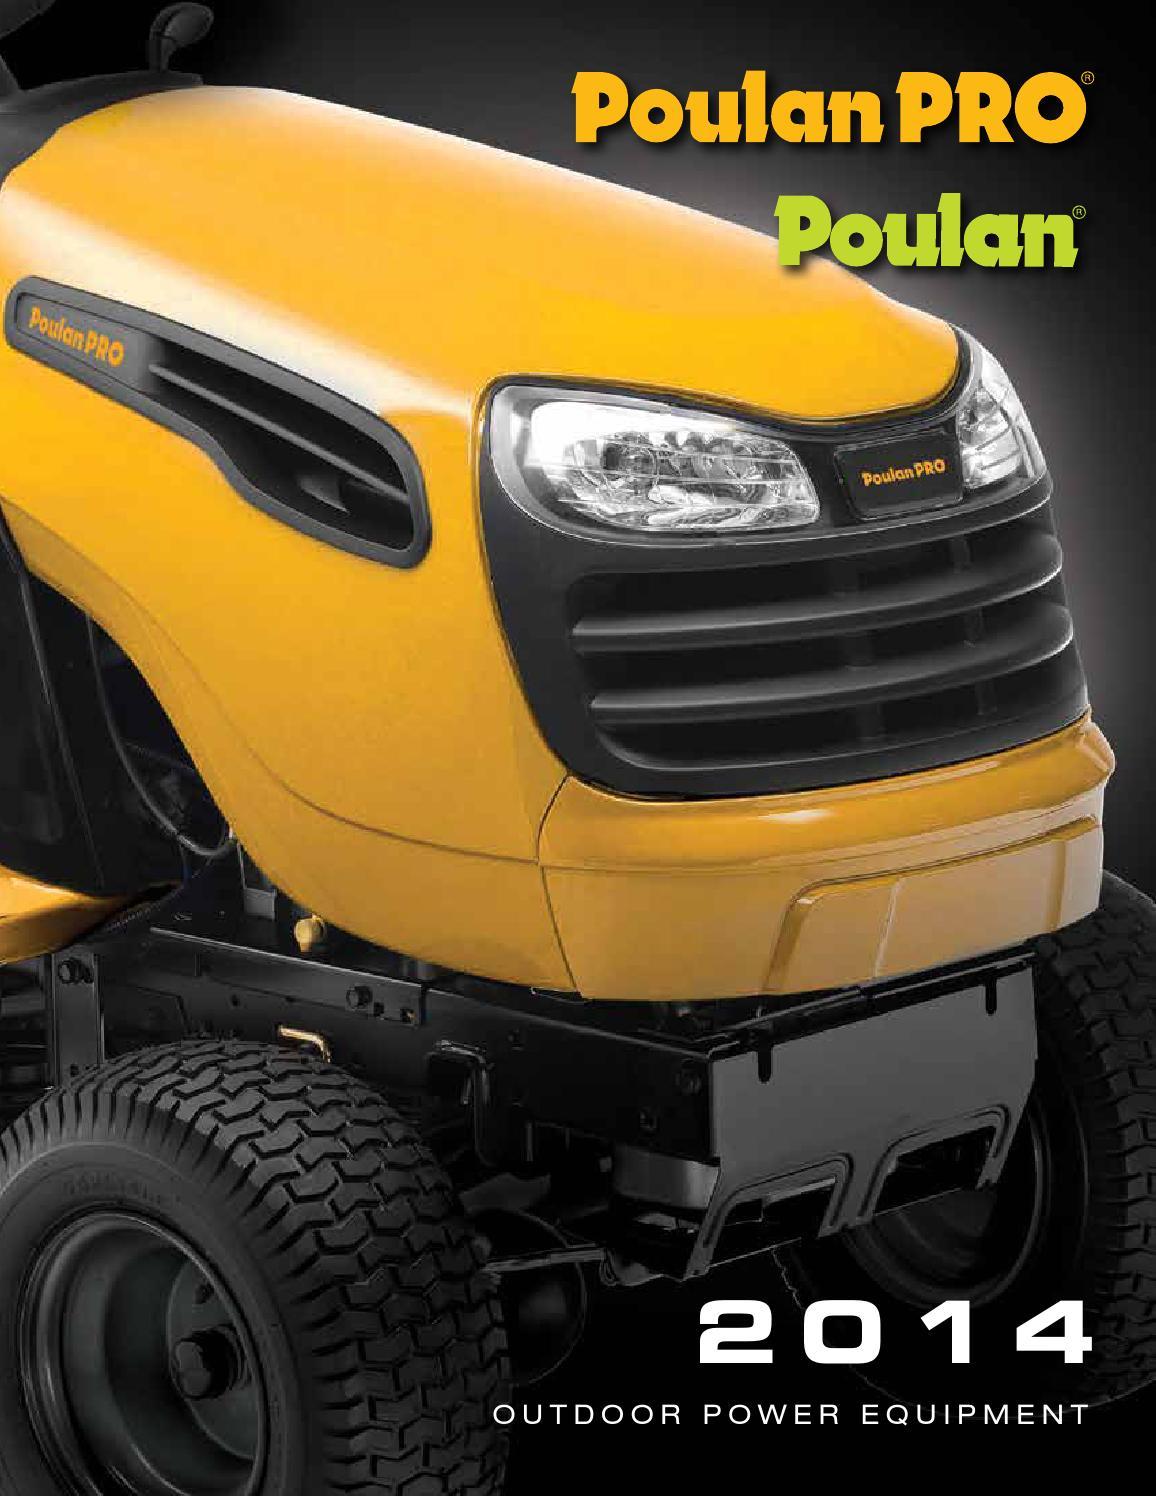 2014 Poulan Pro Catalog By Husqvarna Ab Issuu Fuel Filter